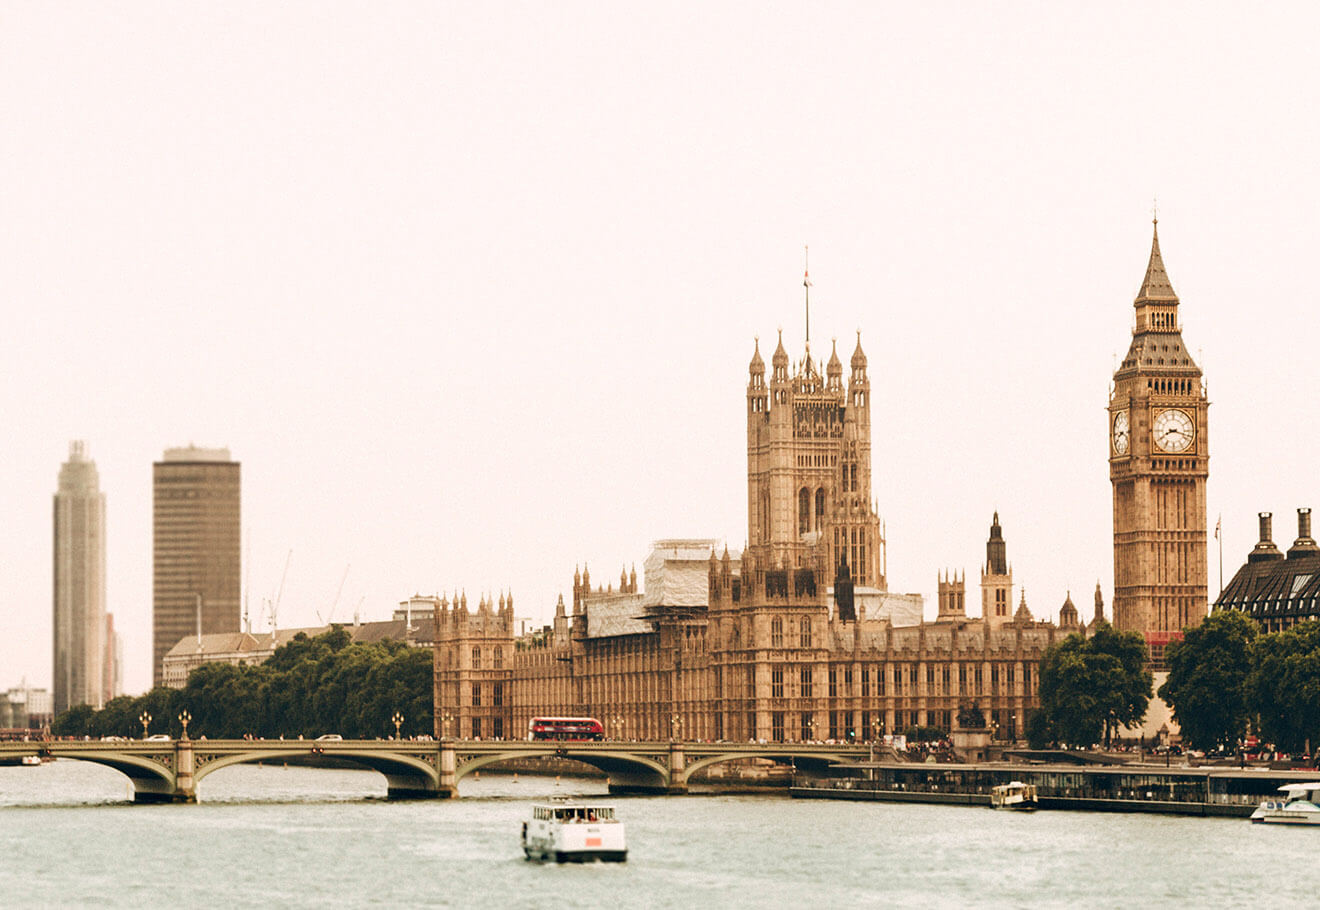 UK Parliament building